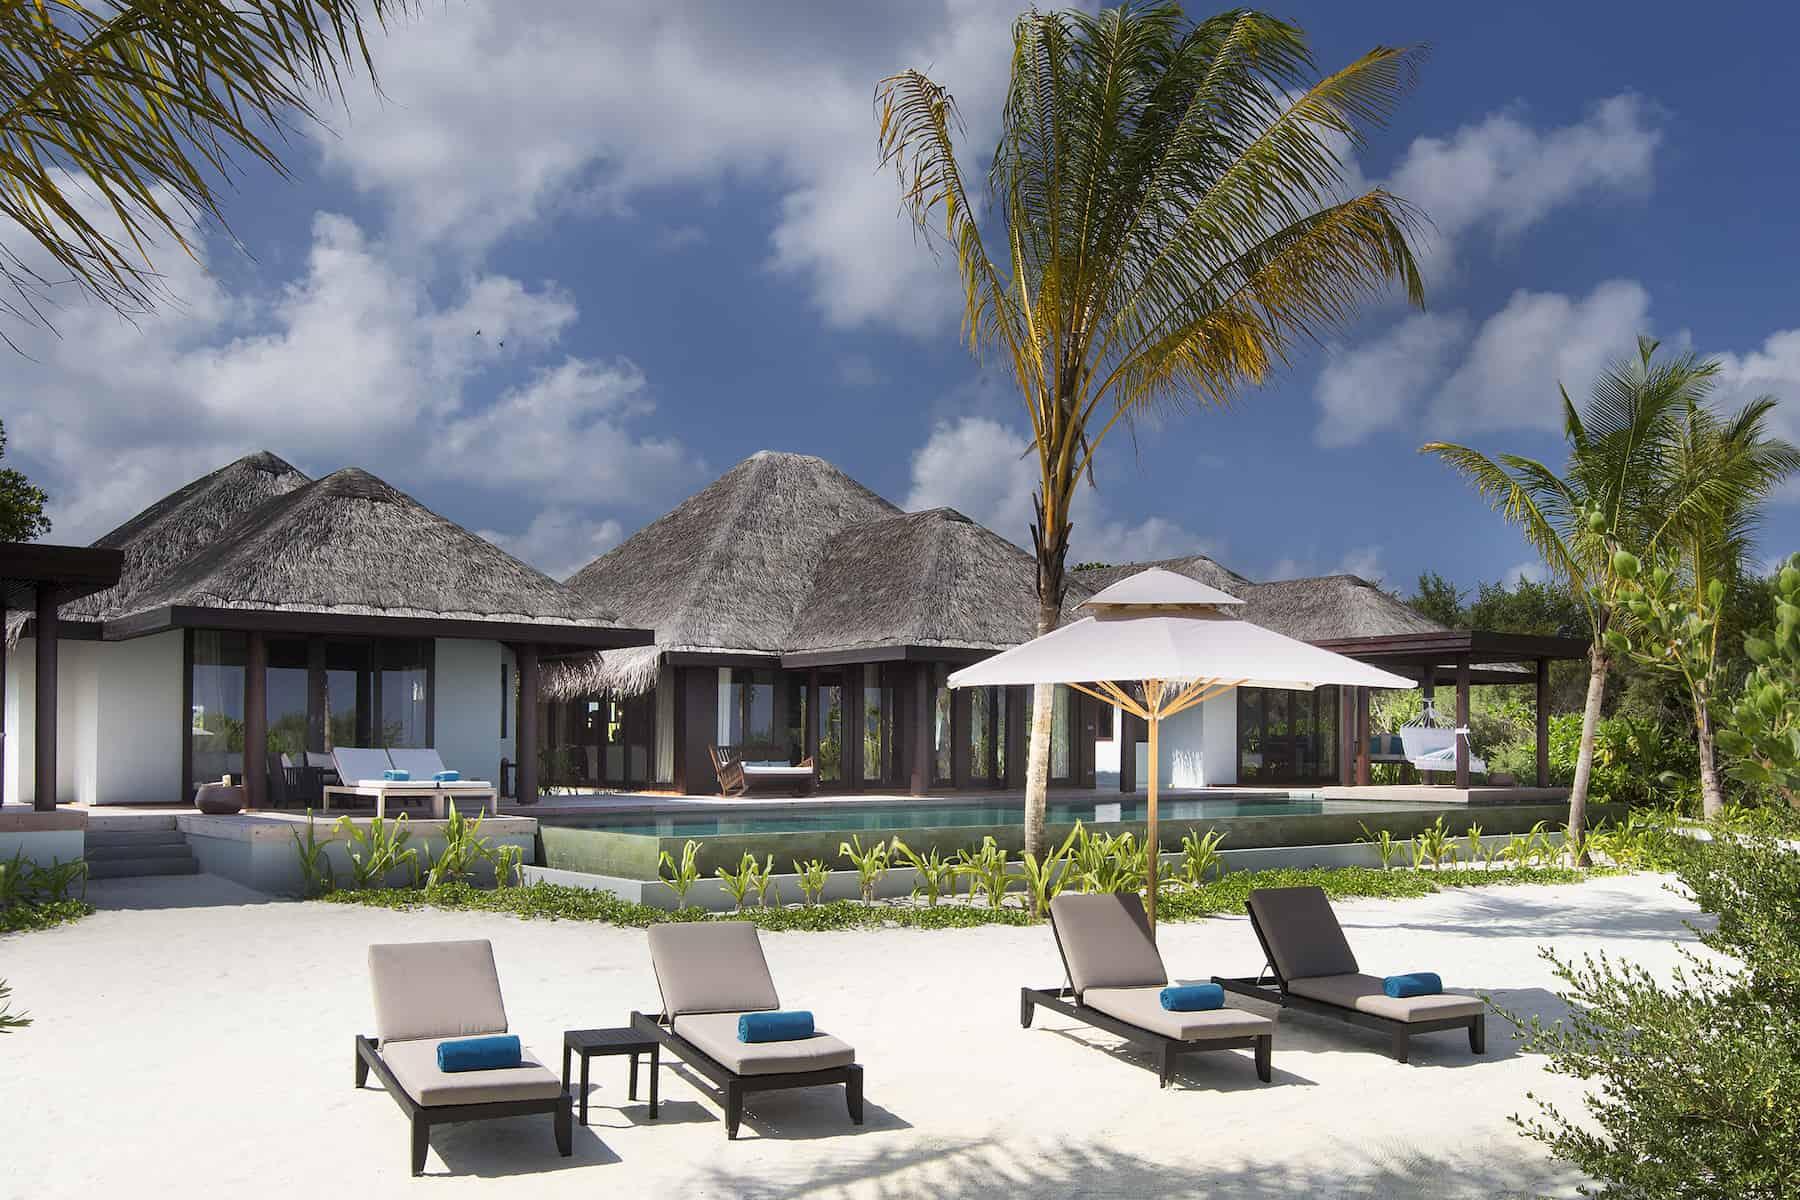 Anantara Kihavah Villas resort Maldive 3 bedroom beach pool residence